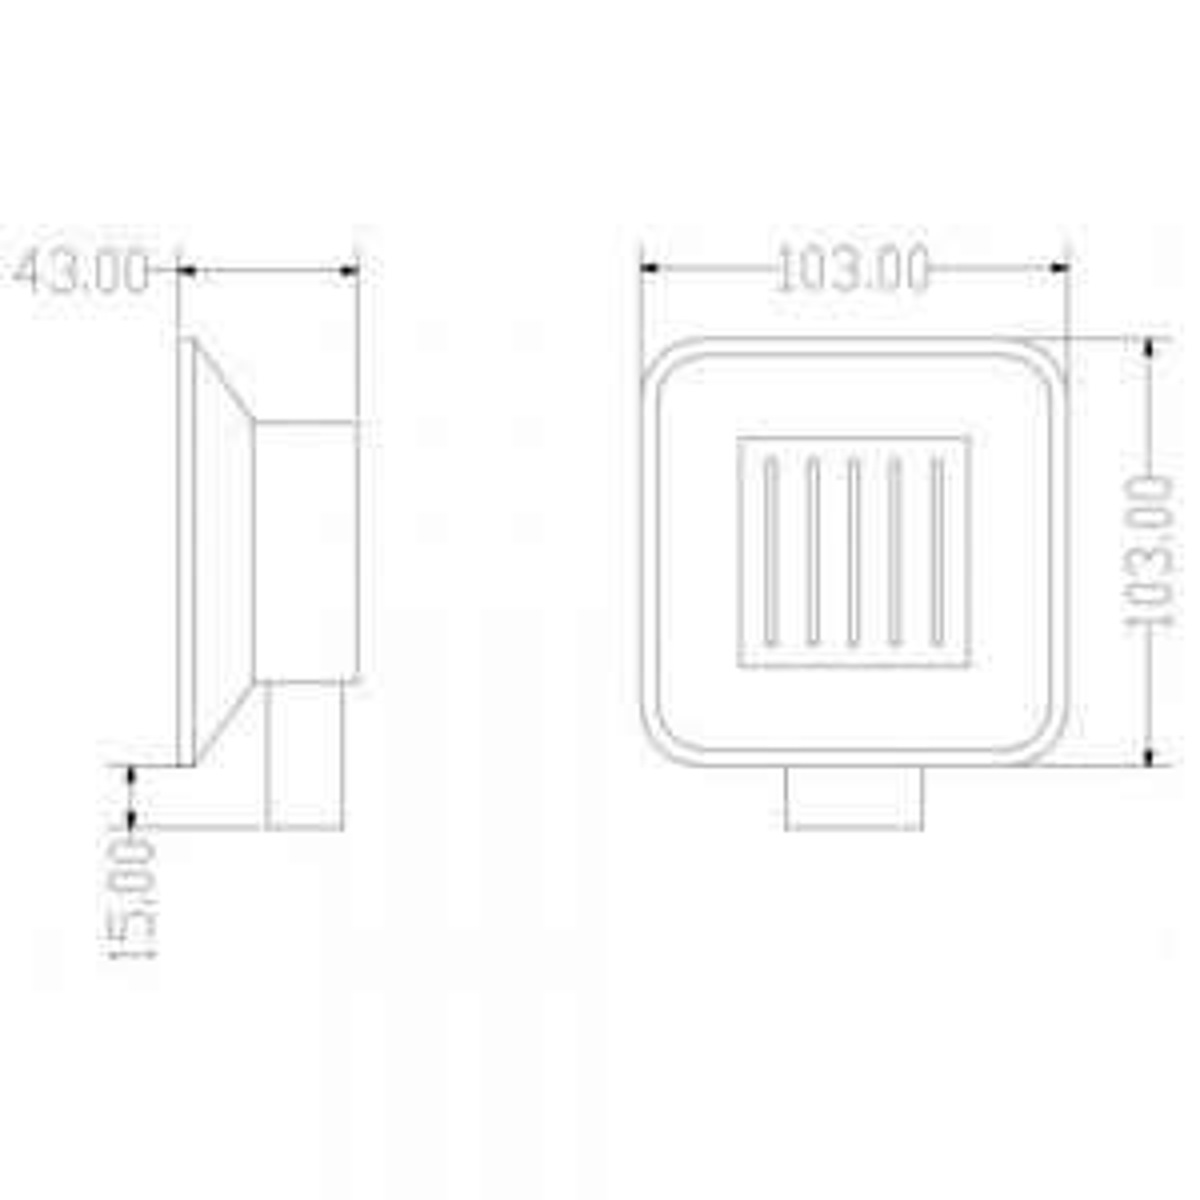 RAK Moon Black Square Wall Mounted Soap Dish Measurements